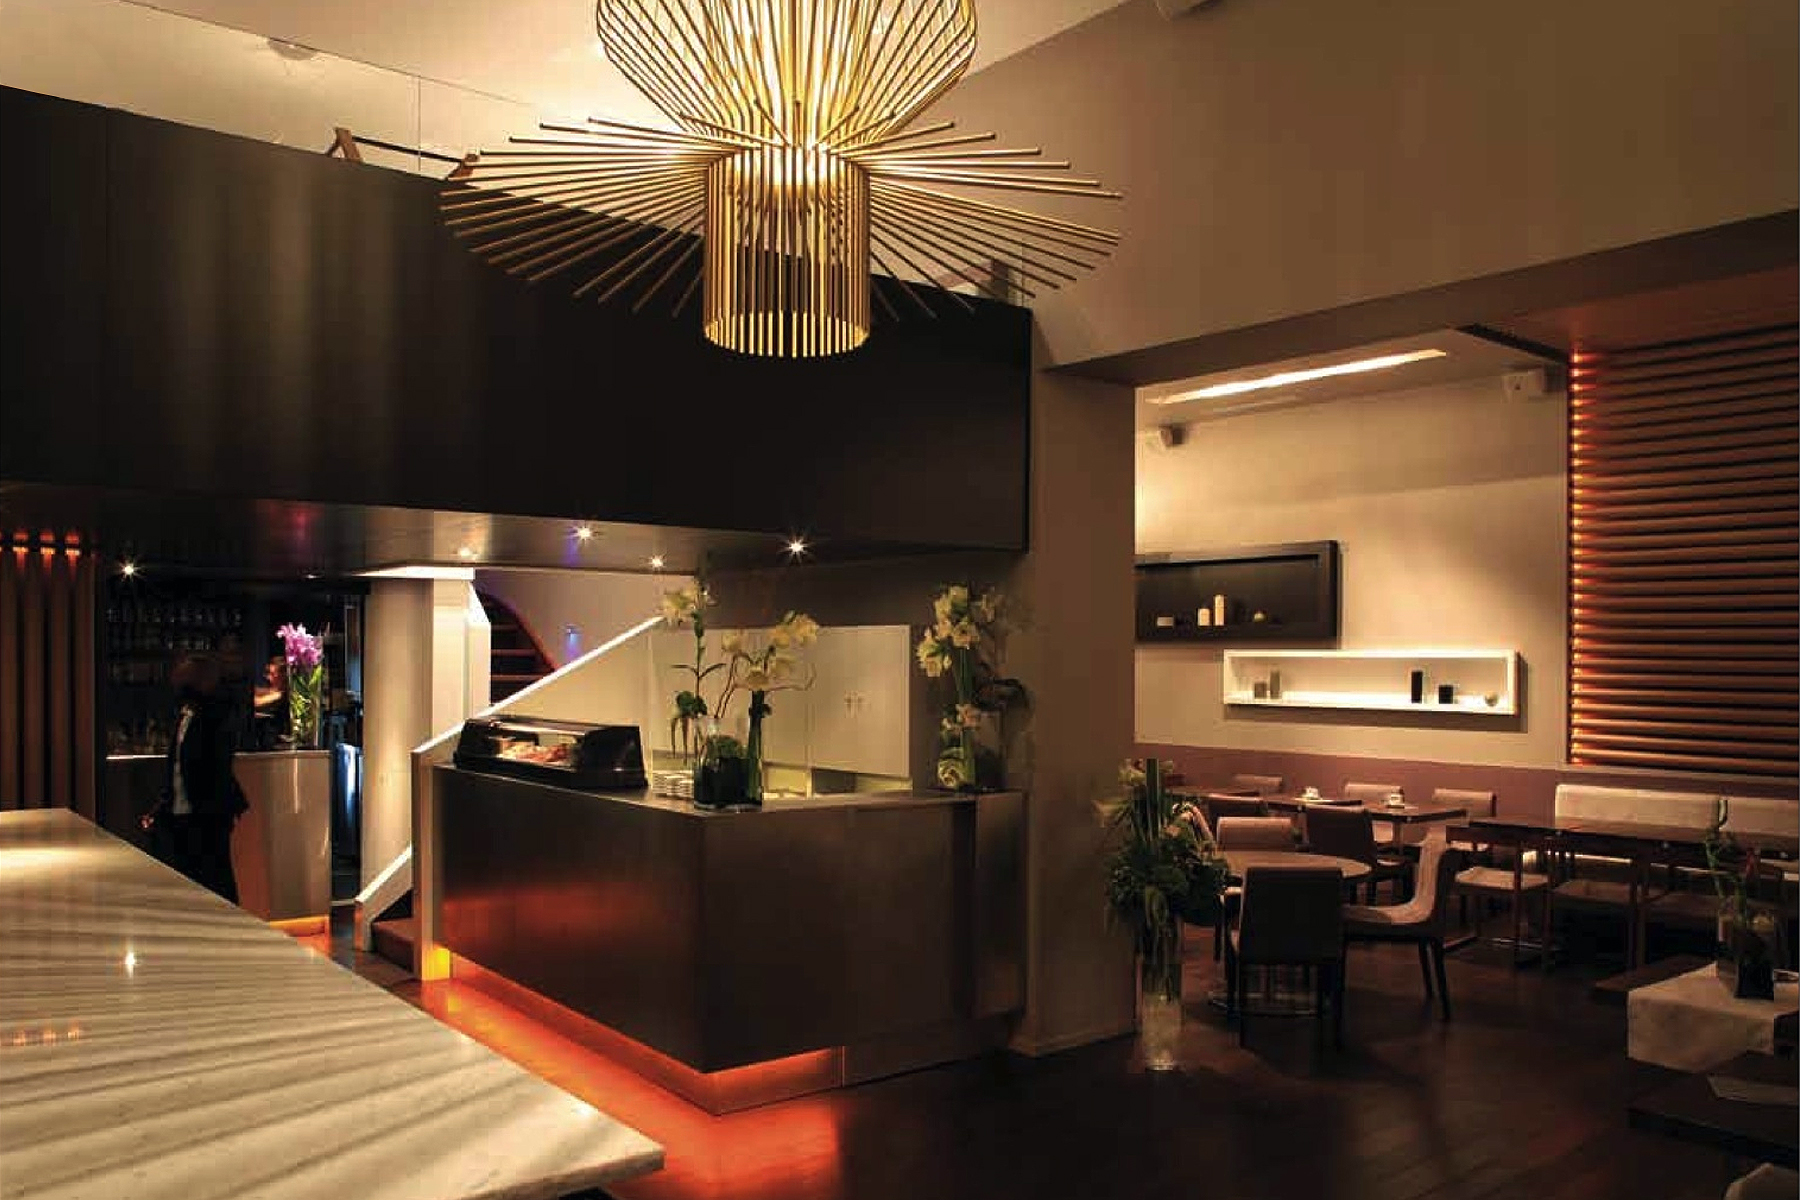 Florence_Watine_Architecte_Designer_Decoratrice_Paris_France_Decoration_Restaurant